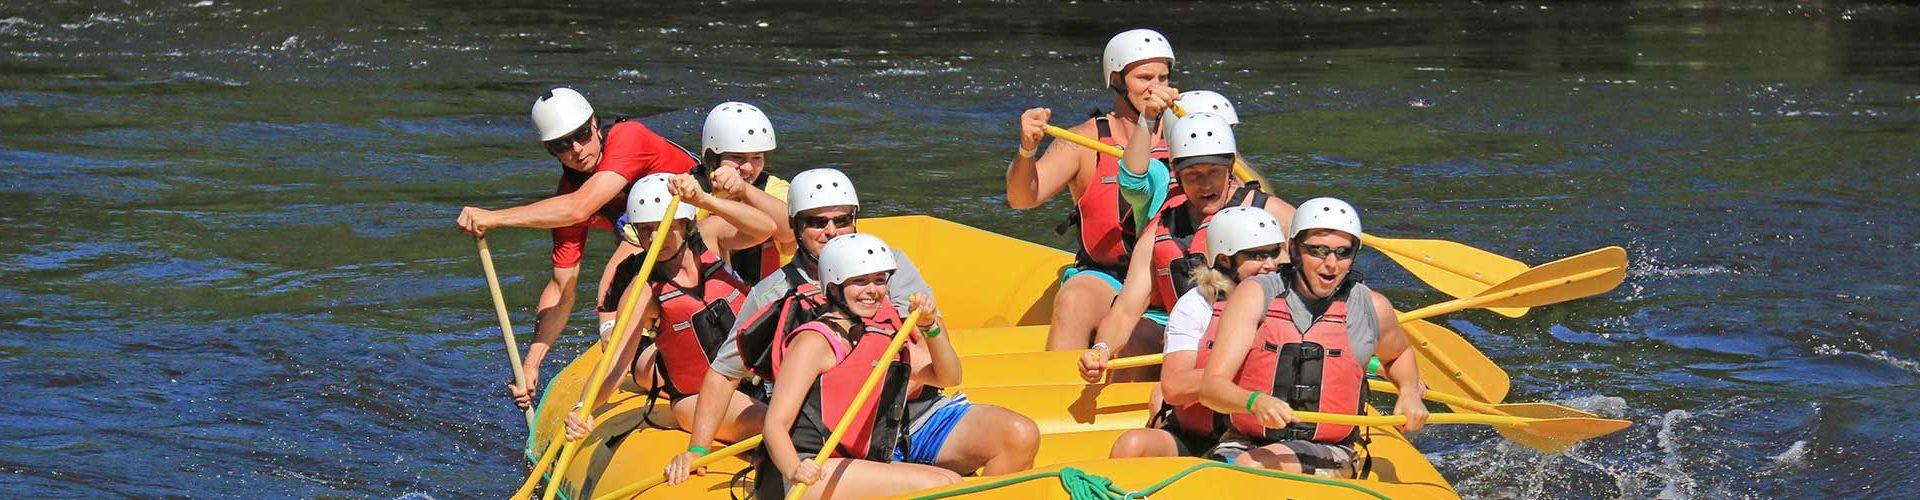 High Adventure Rafting with River Run Ottawa River